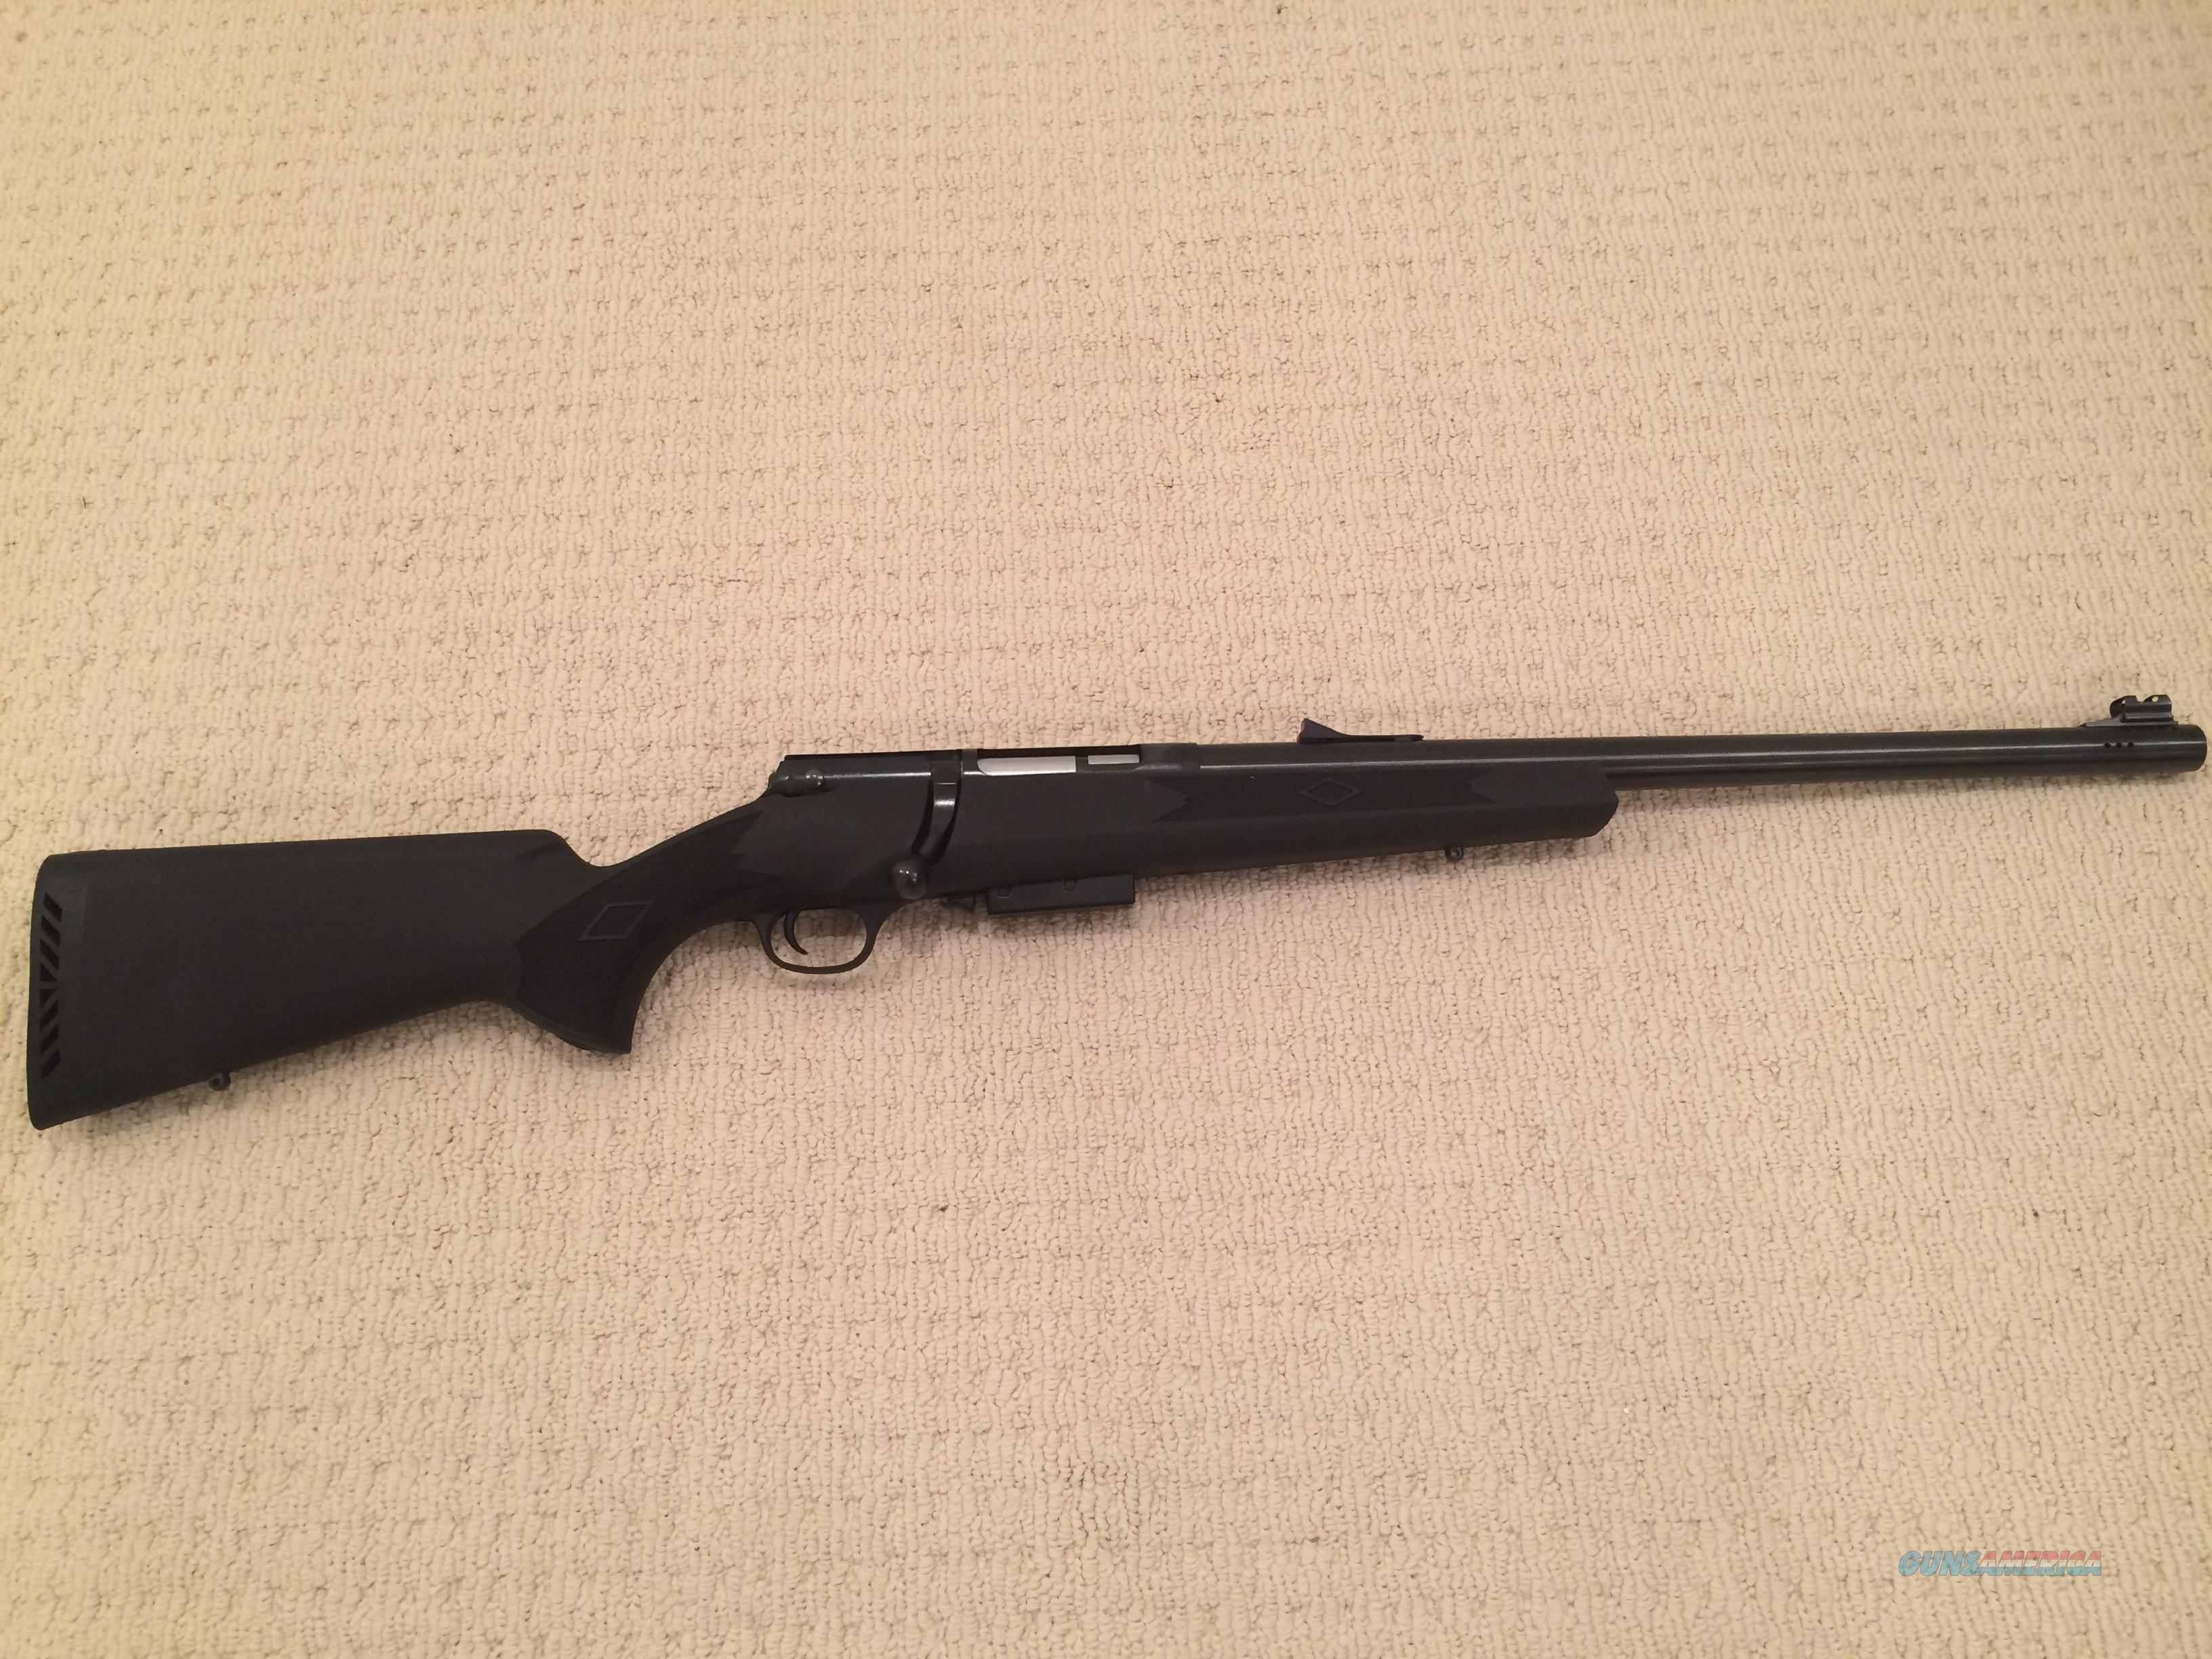 1st year Marlin Model 512-P Slugmaster from 1999